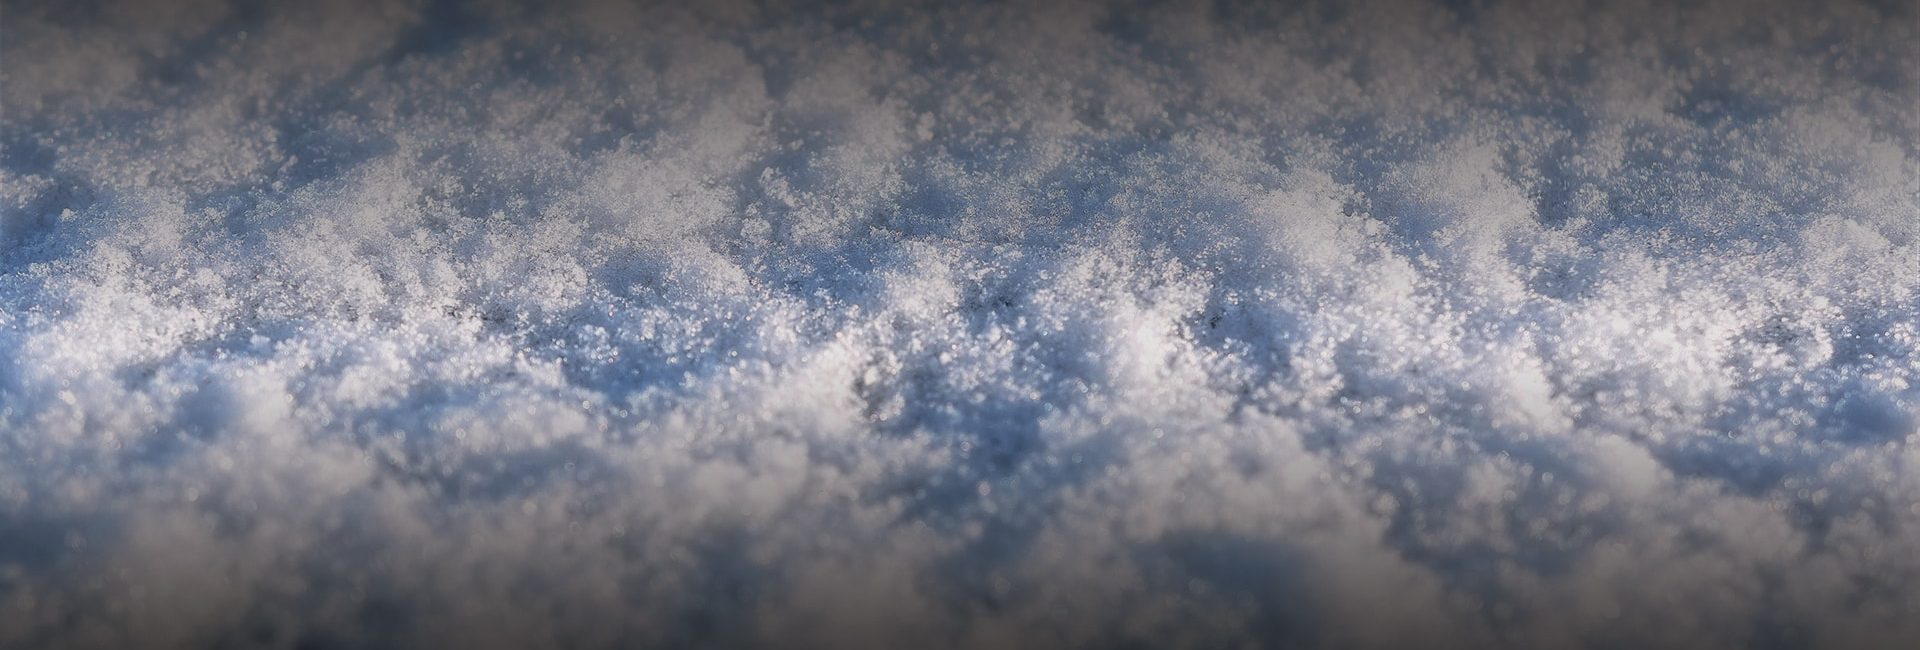 Storm Recap:  Summary of the December 30-31 Snow Event